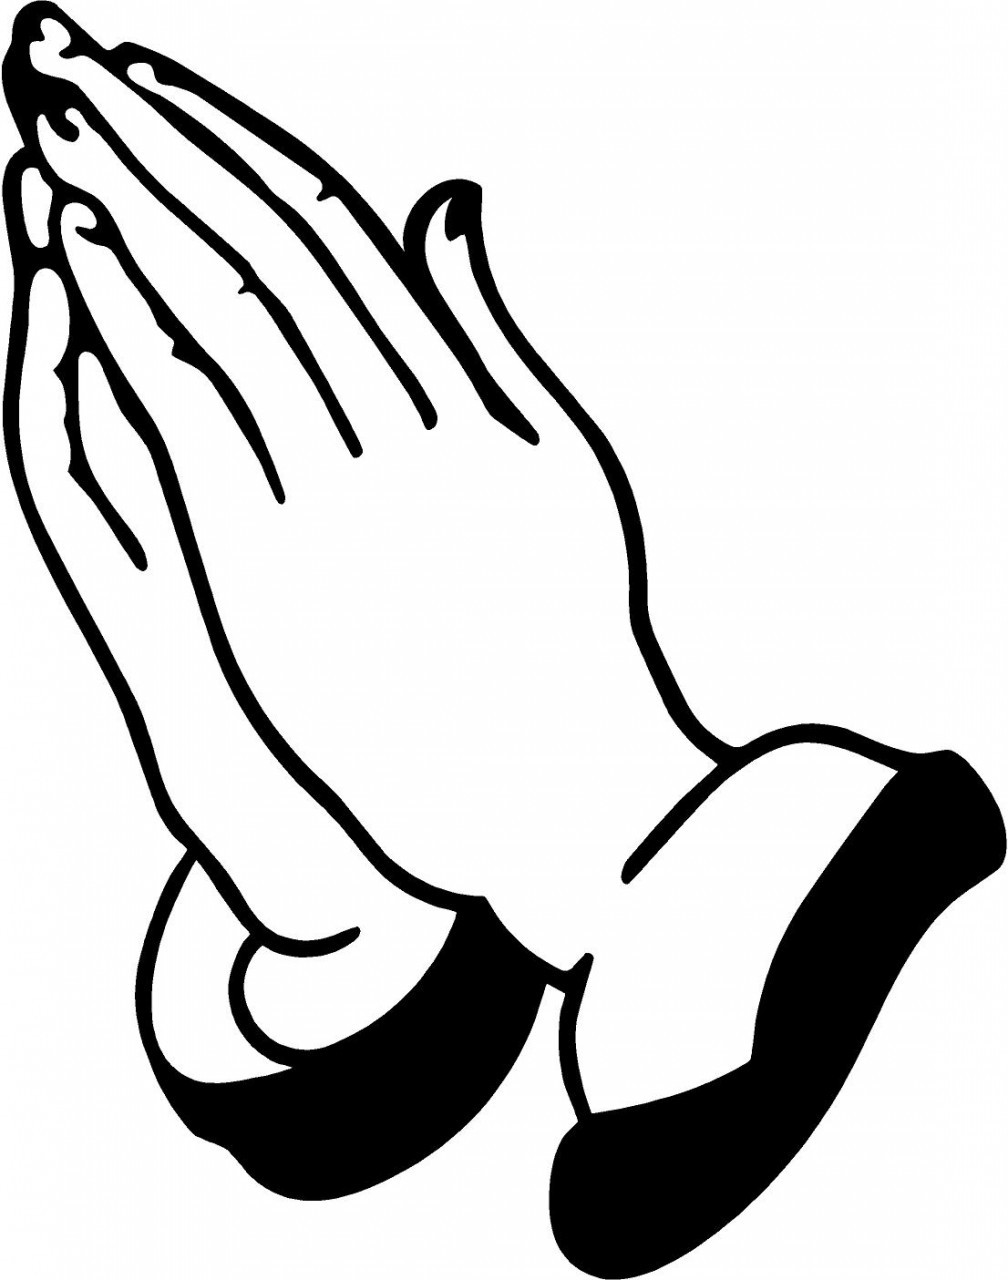 1008x1280 Praying Hands Praying Hand Child Prayer Hands Clip Art Clipartcow